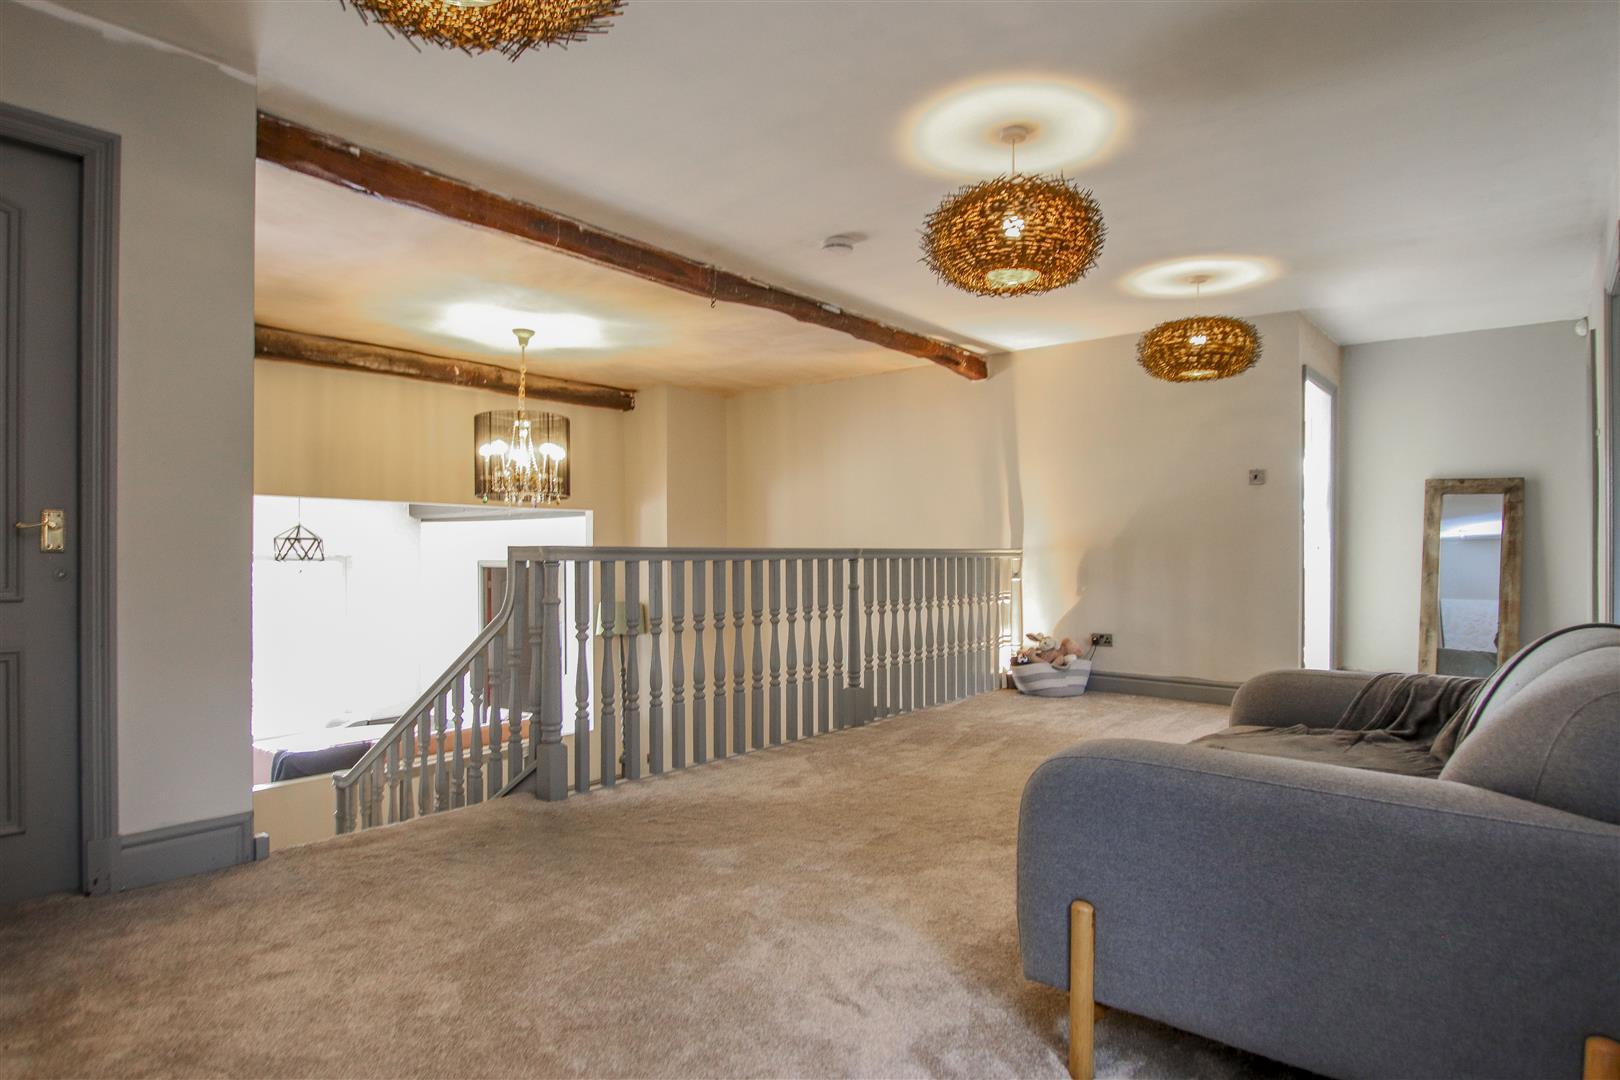 6 Bedroom Barn Conversion For Sale - 44.JPG